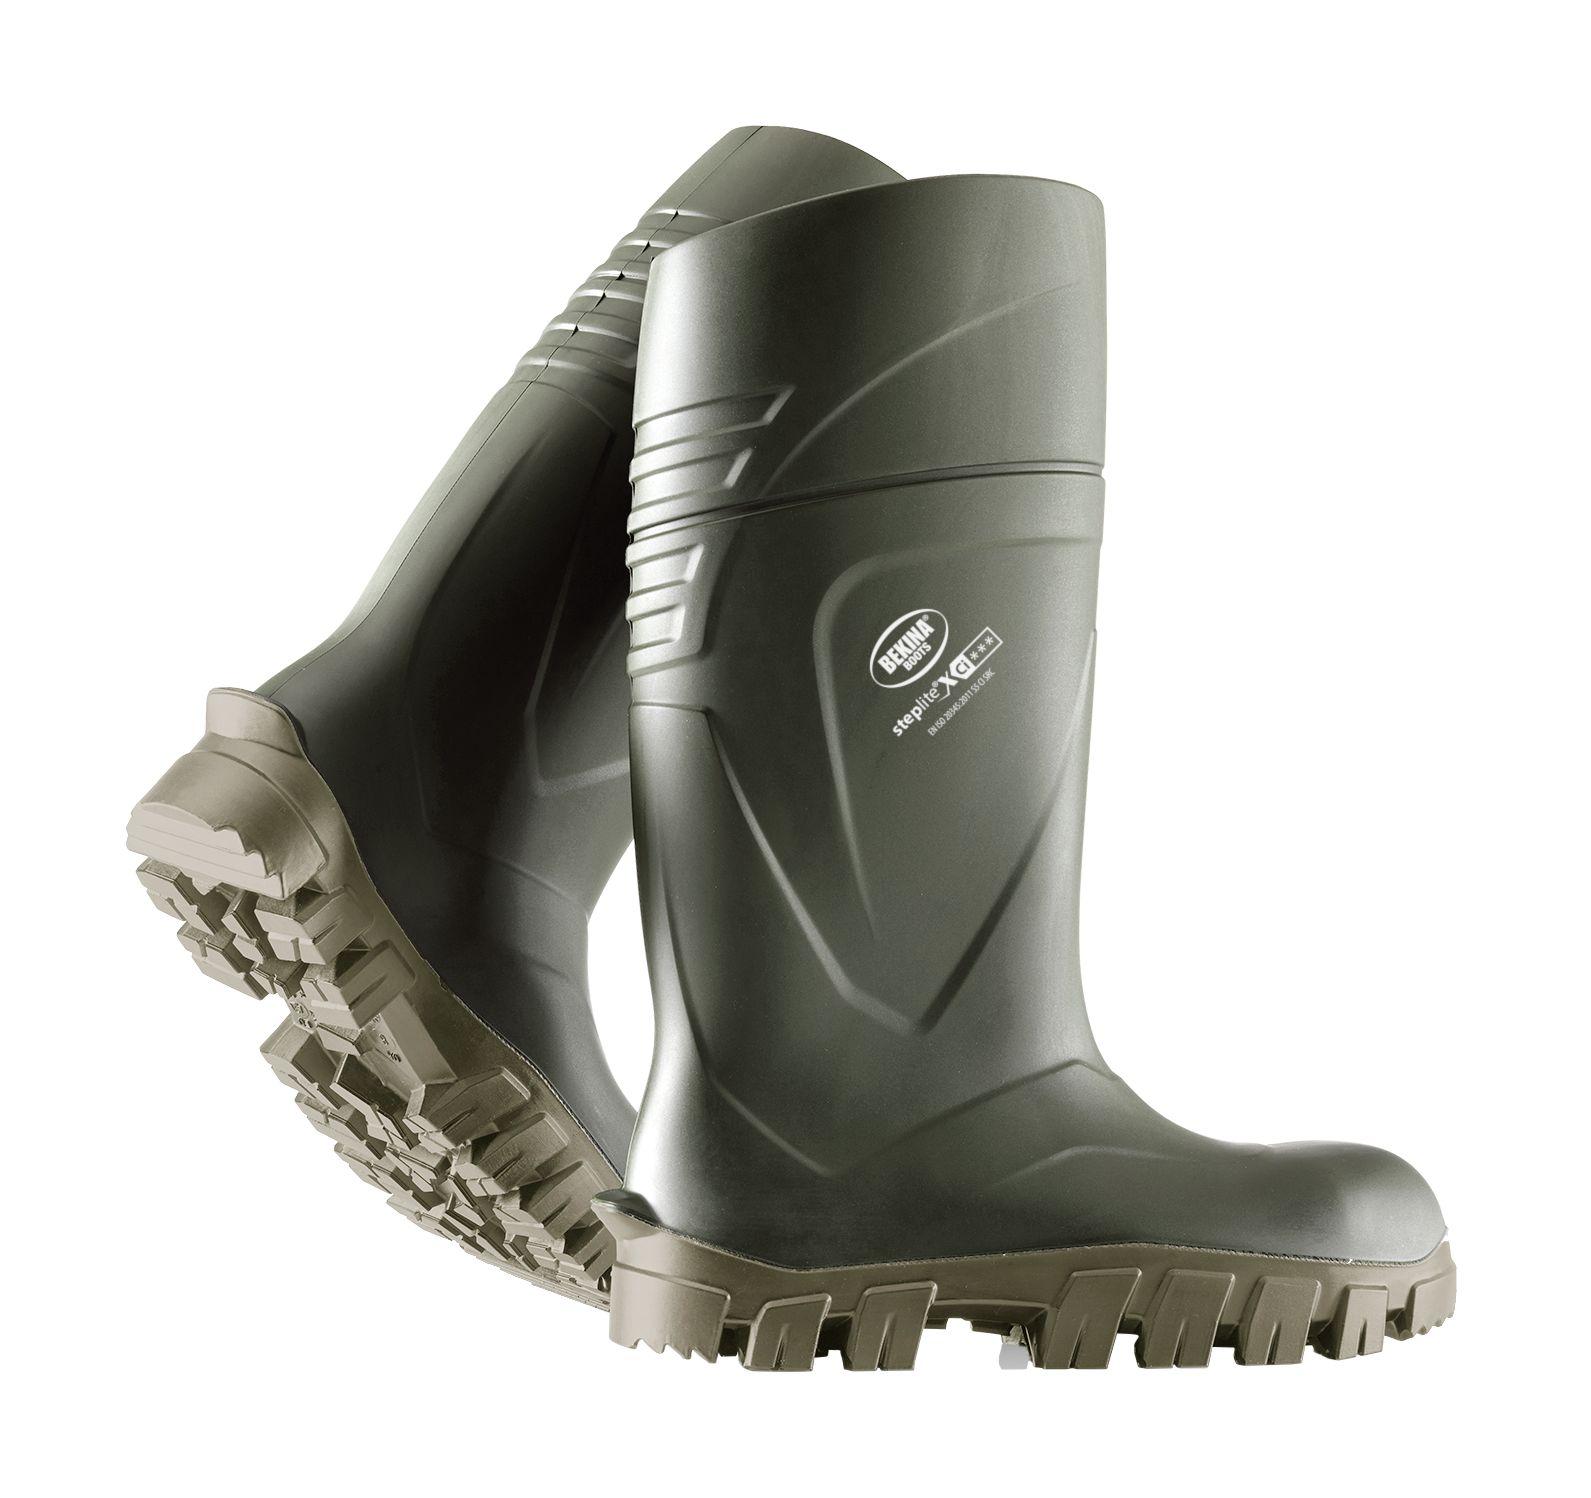 Cizme de protectie Bekina S5 StepliteXCI pentru iarna